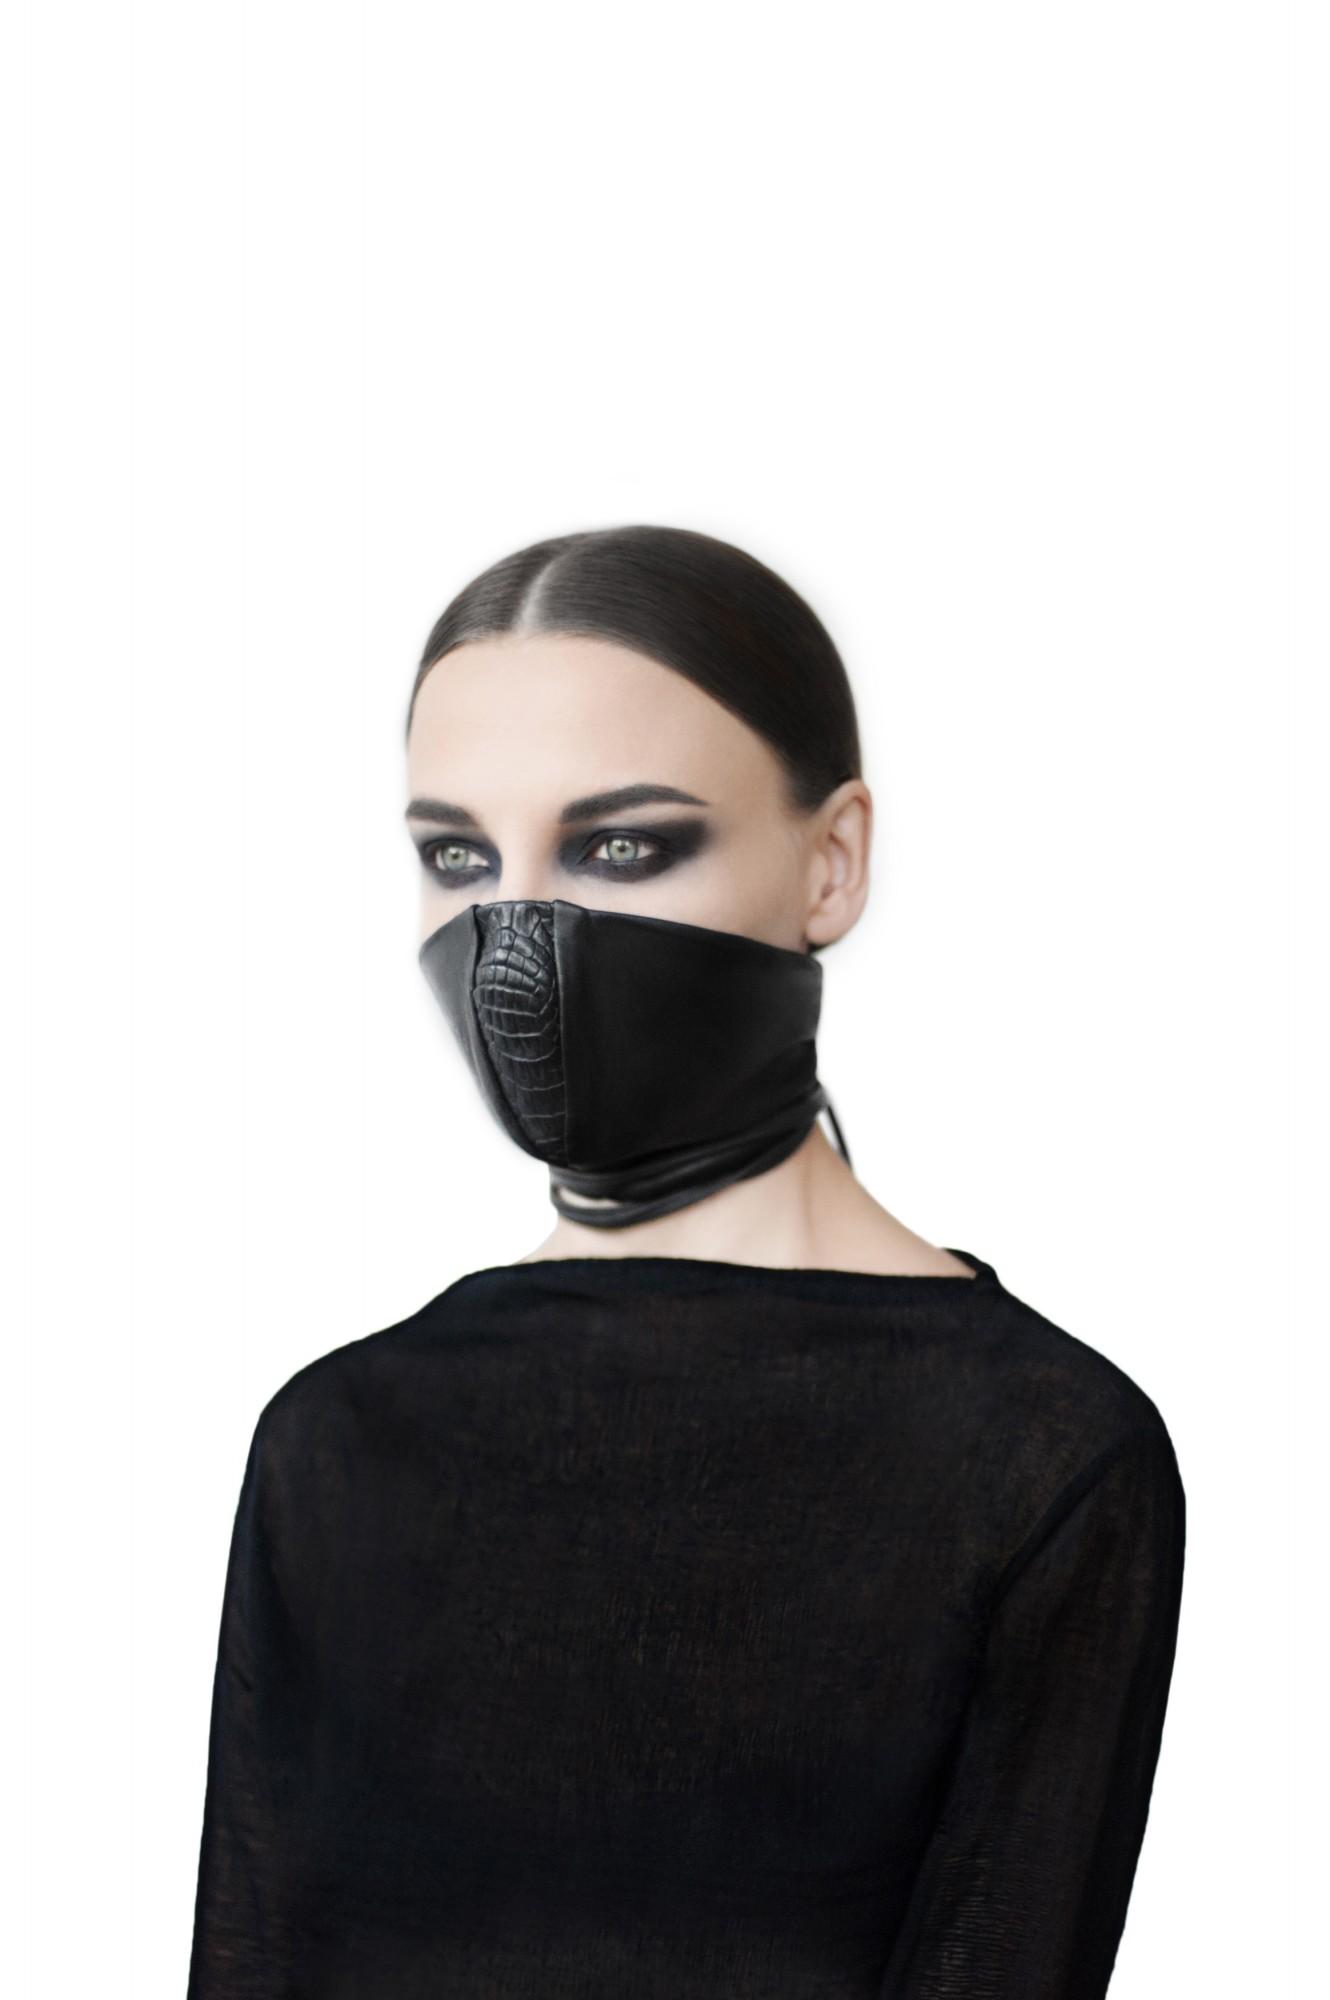 Nutsa Modebadze NM7070 crocodile leather mask - unconventional